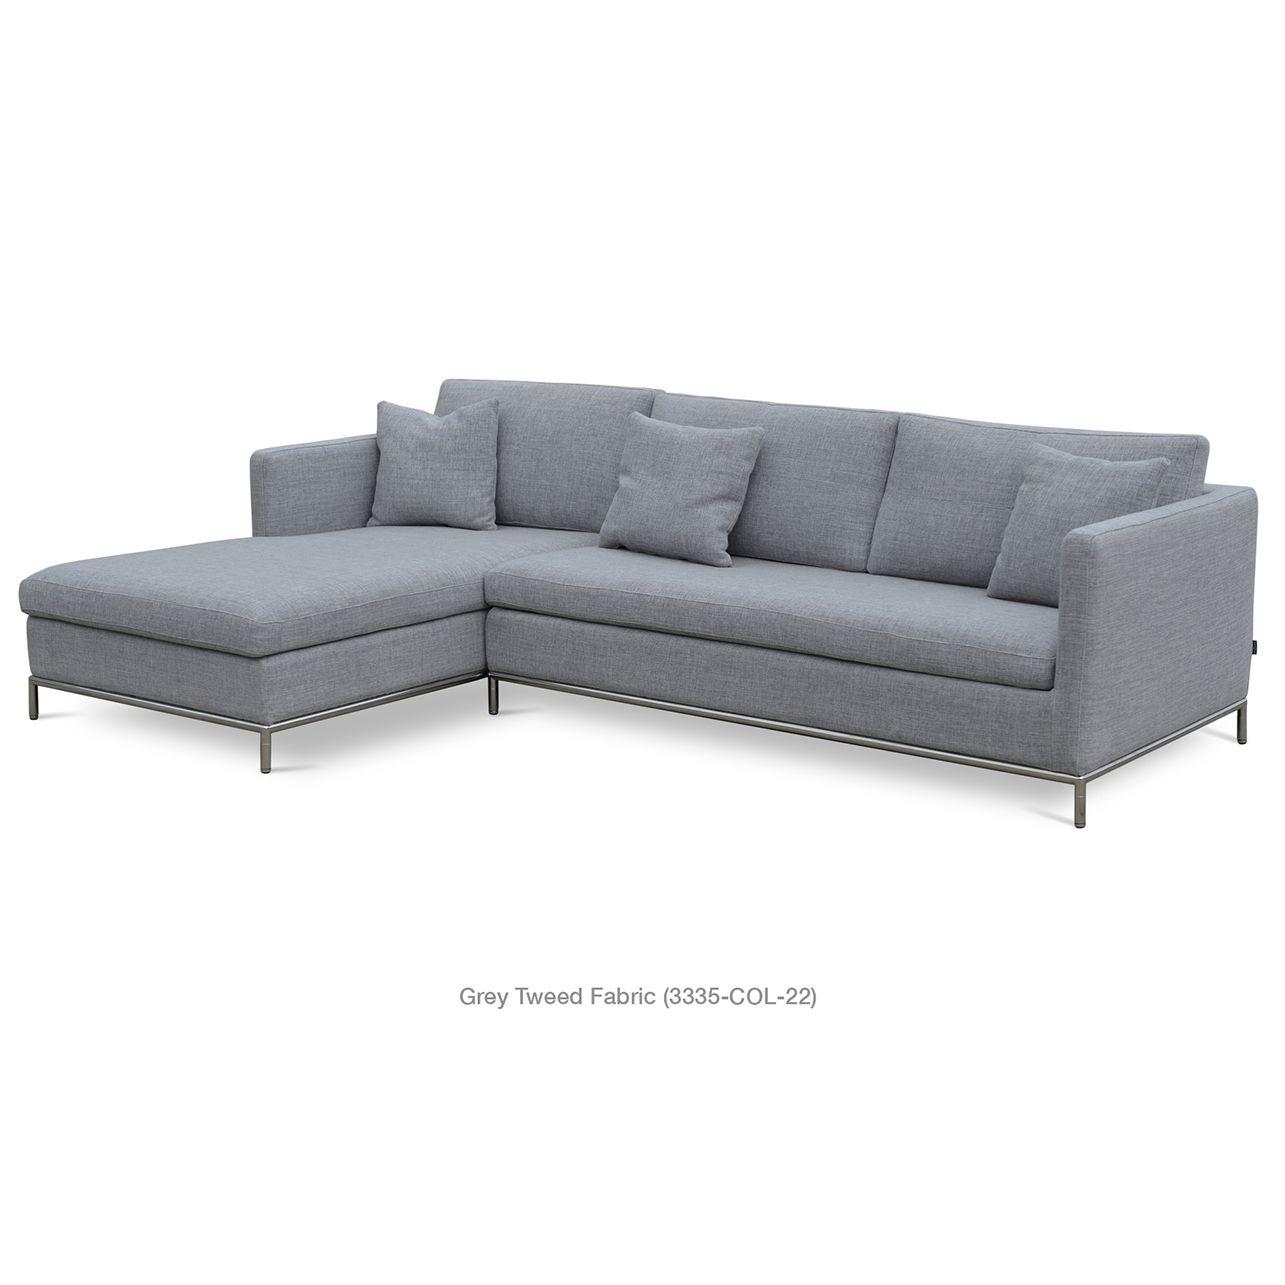 Strange Istanbul Sectional Sofa In Grey Tweed By Sohoconcept Download Free Architecture Designs Scobabritishbridgeorg